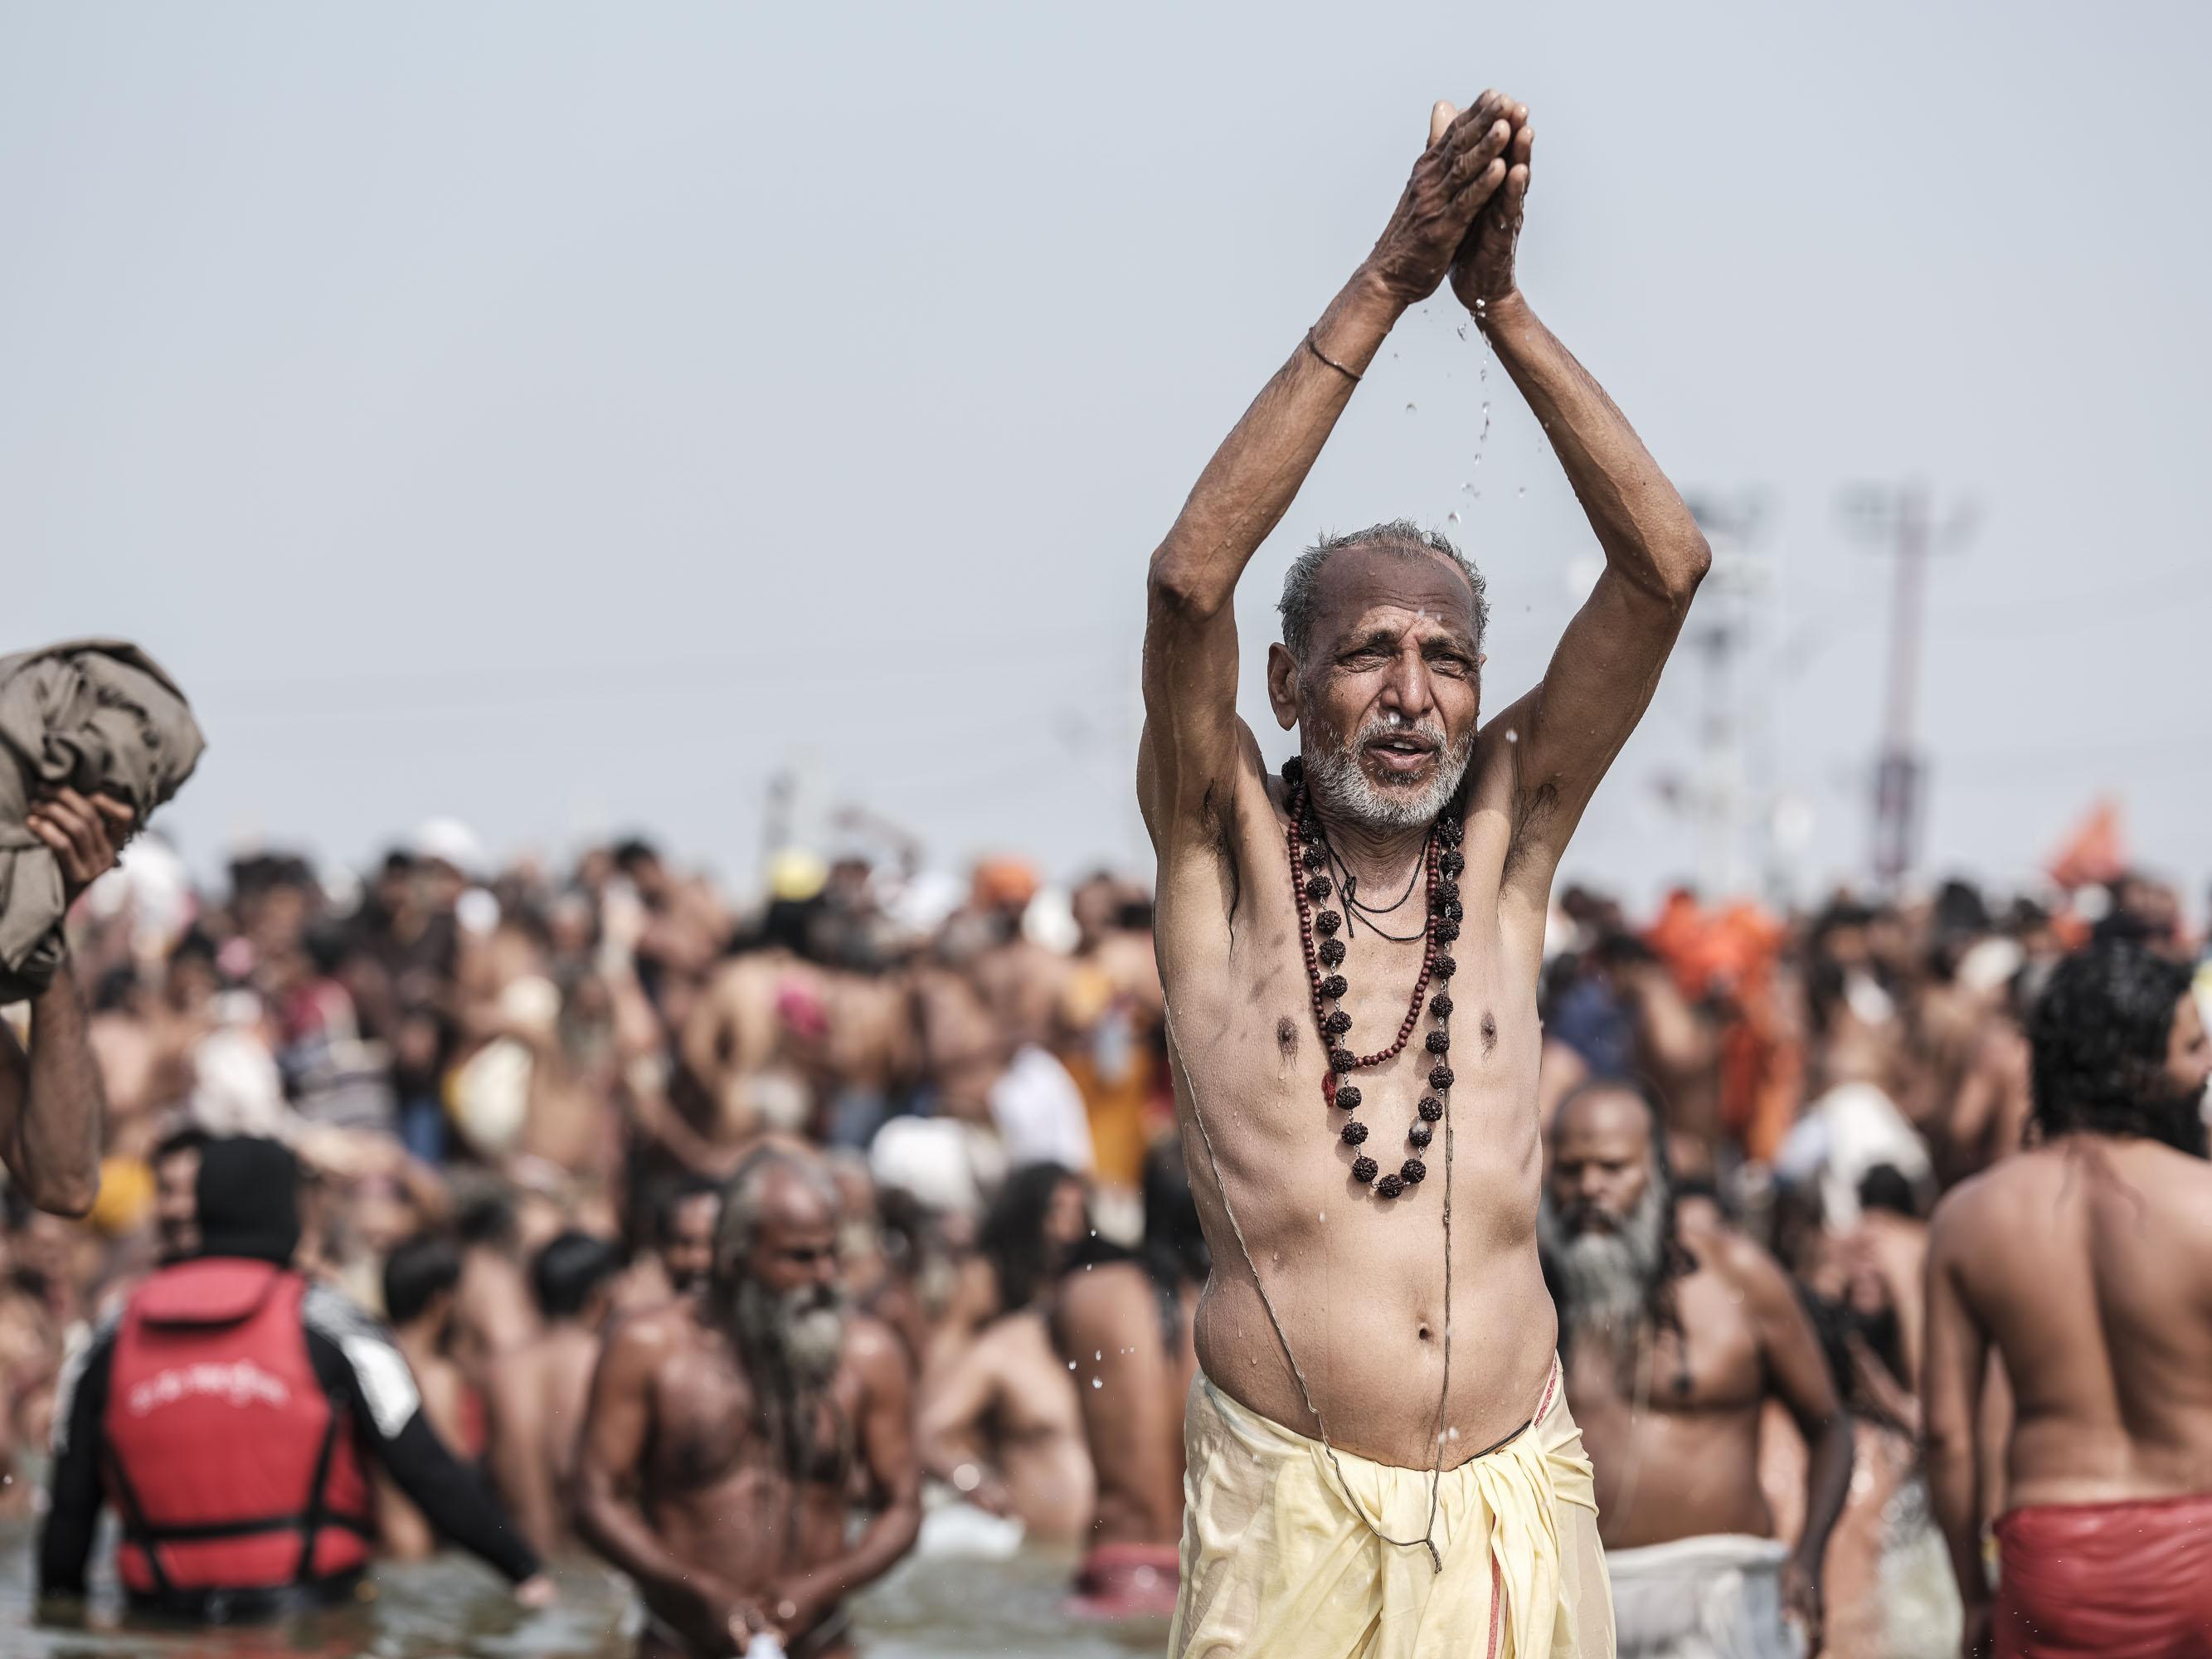 man prayer 4 february pilgrims Kumbh mela 2019 India Allahabad Prayagraj Ardh hindu religious Festival event rivers photographer jose jeuland photography